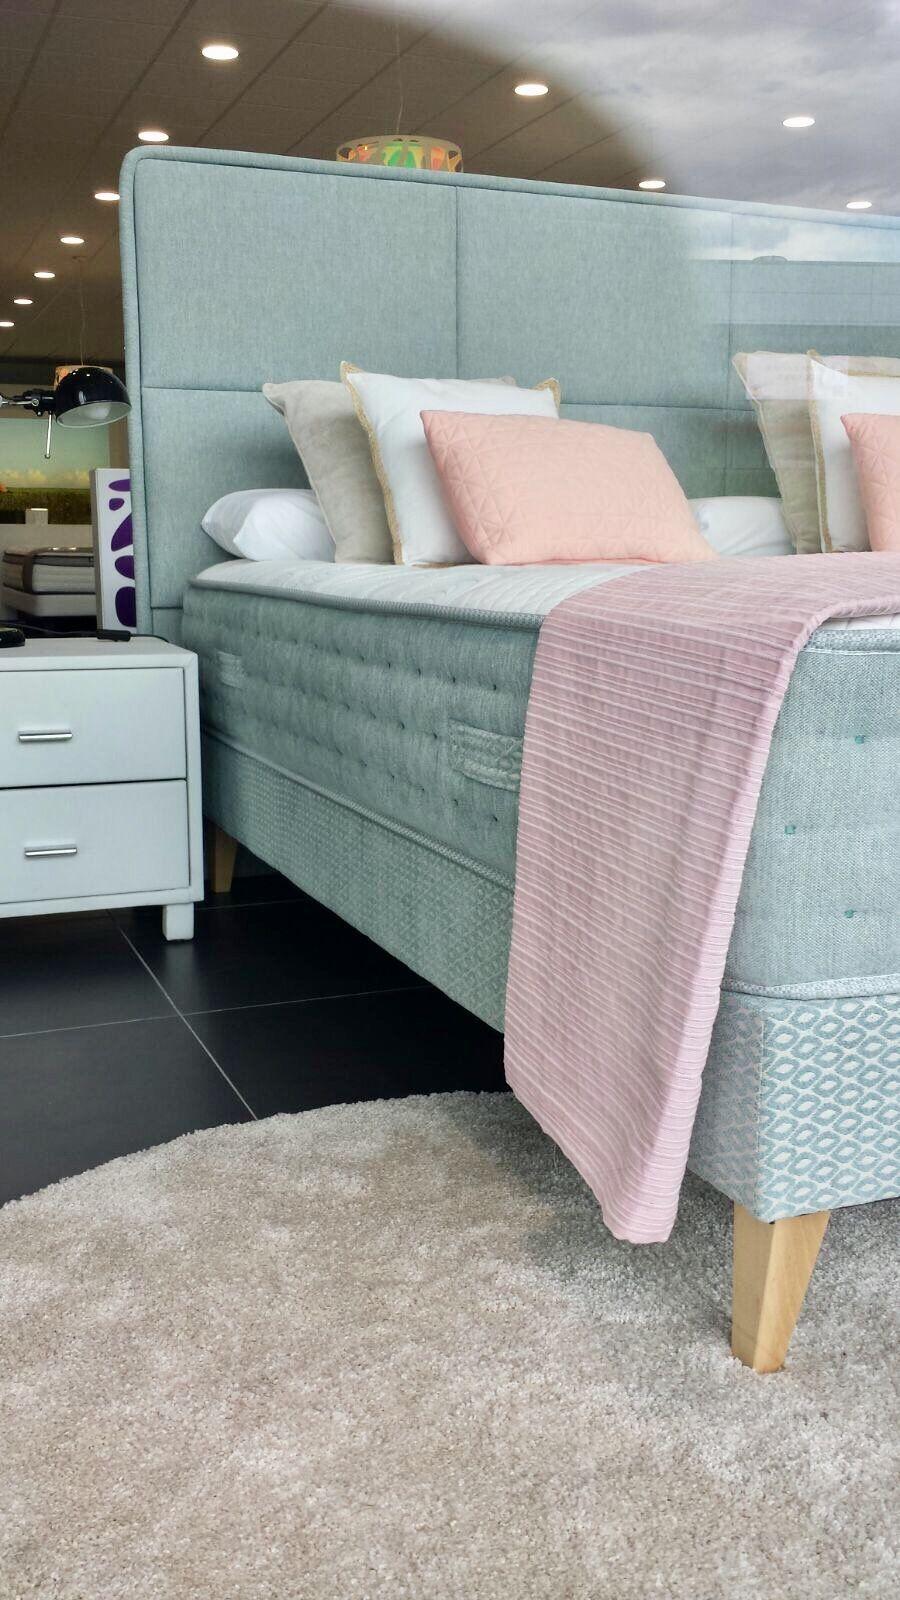 Tienda De Colchones Literas Canapés Envío Gratis Home Decor Bed Mattress